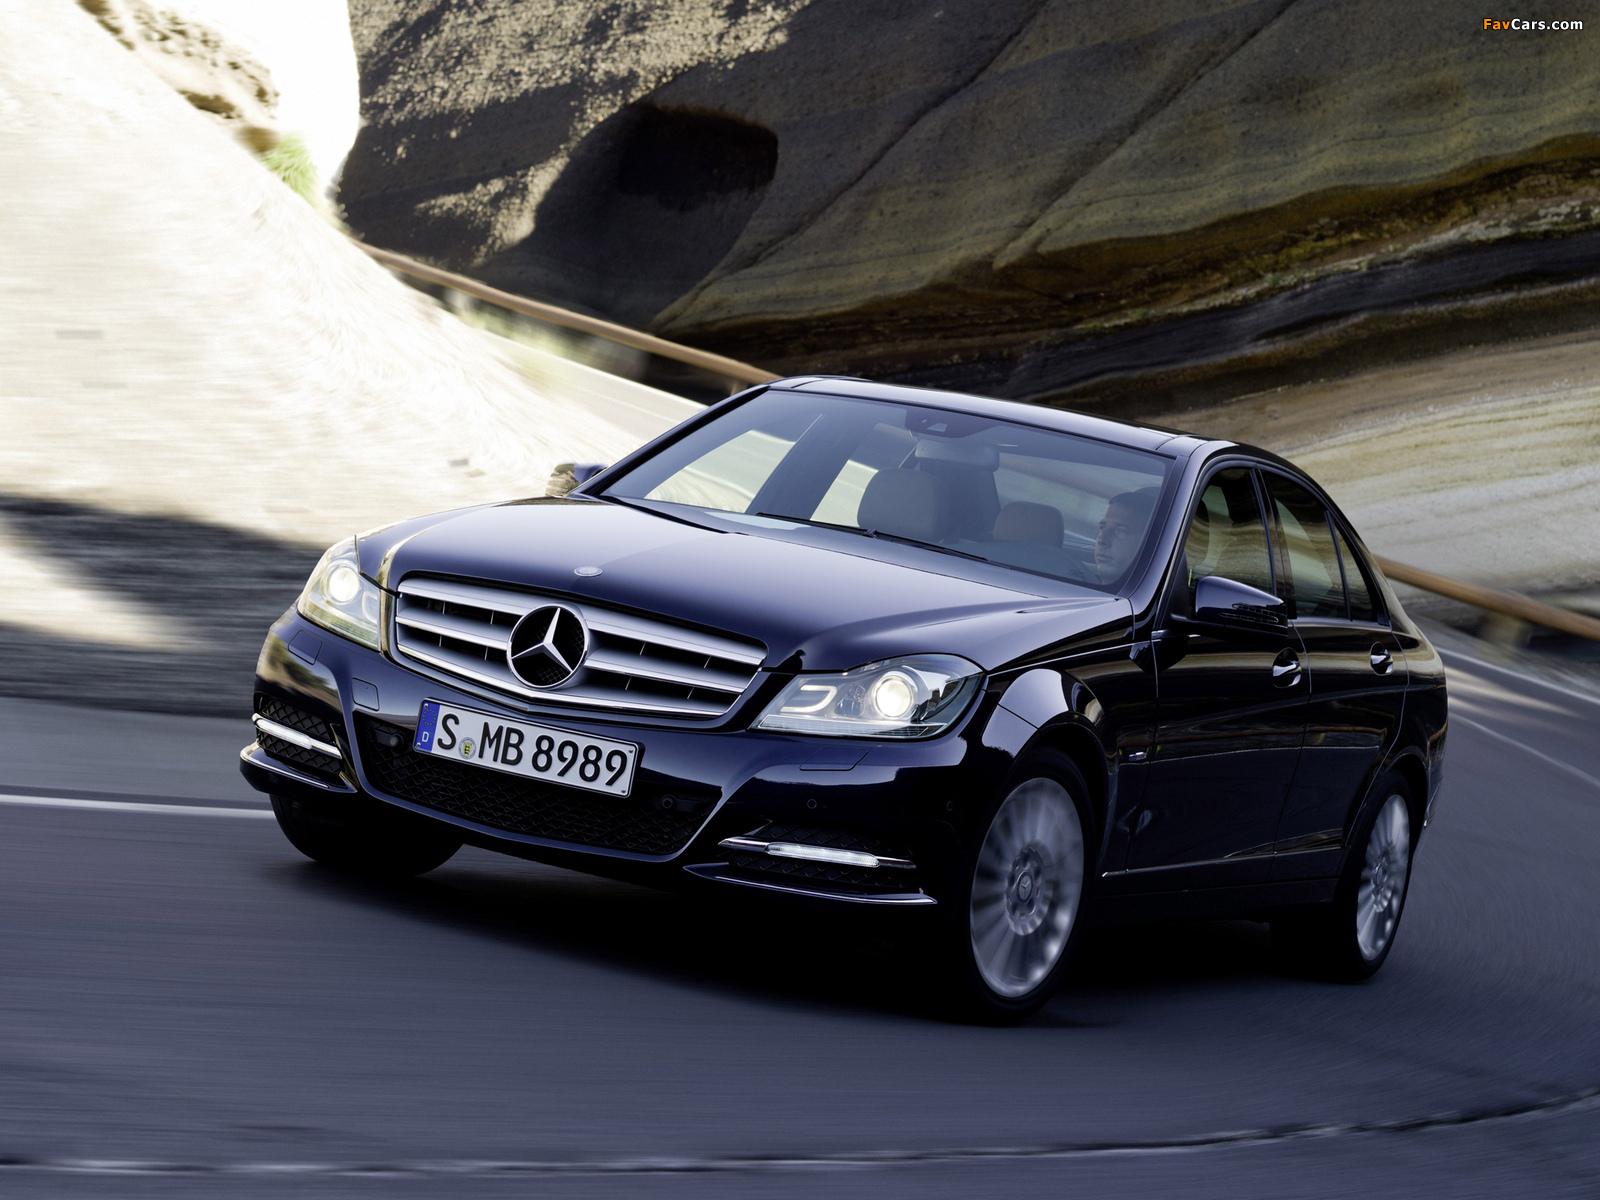 Mercedes-Benz C 250 CDI BlueEfficiency (W204) 2011 wallpapers (1600 x 1200)